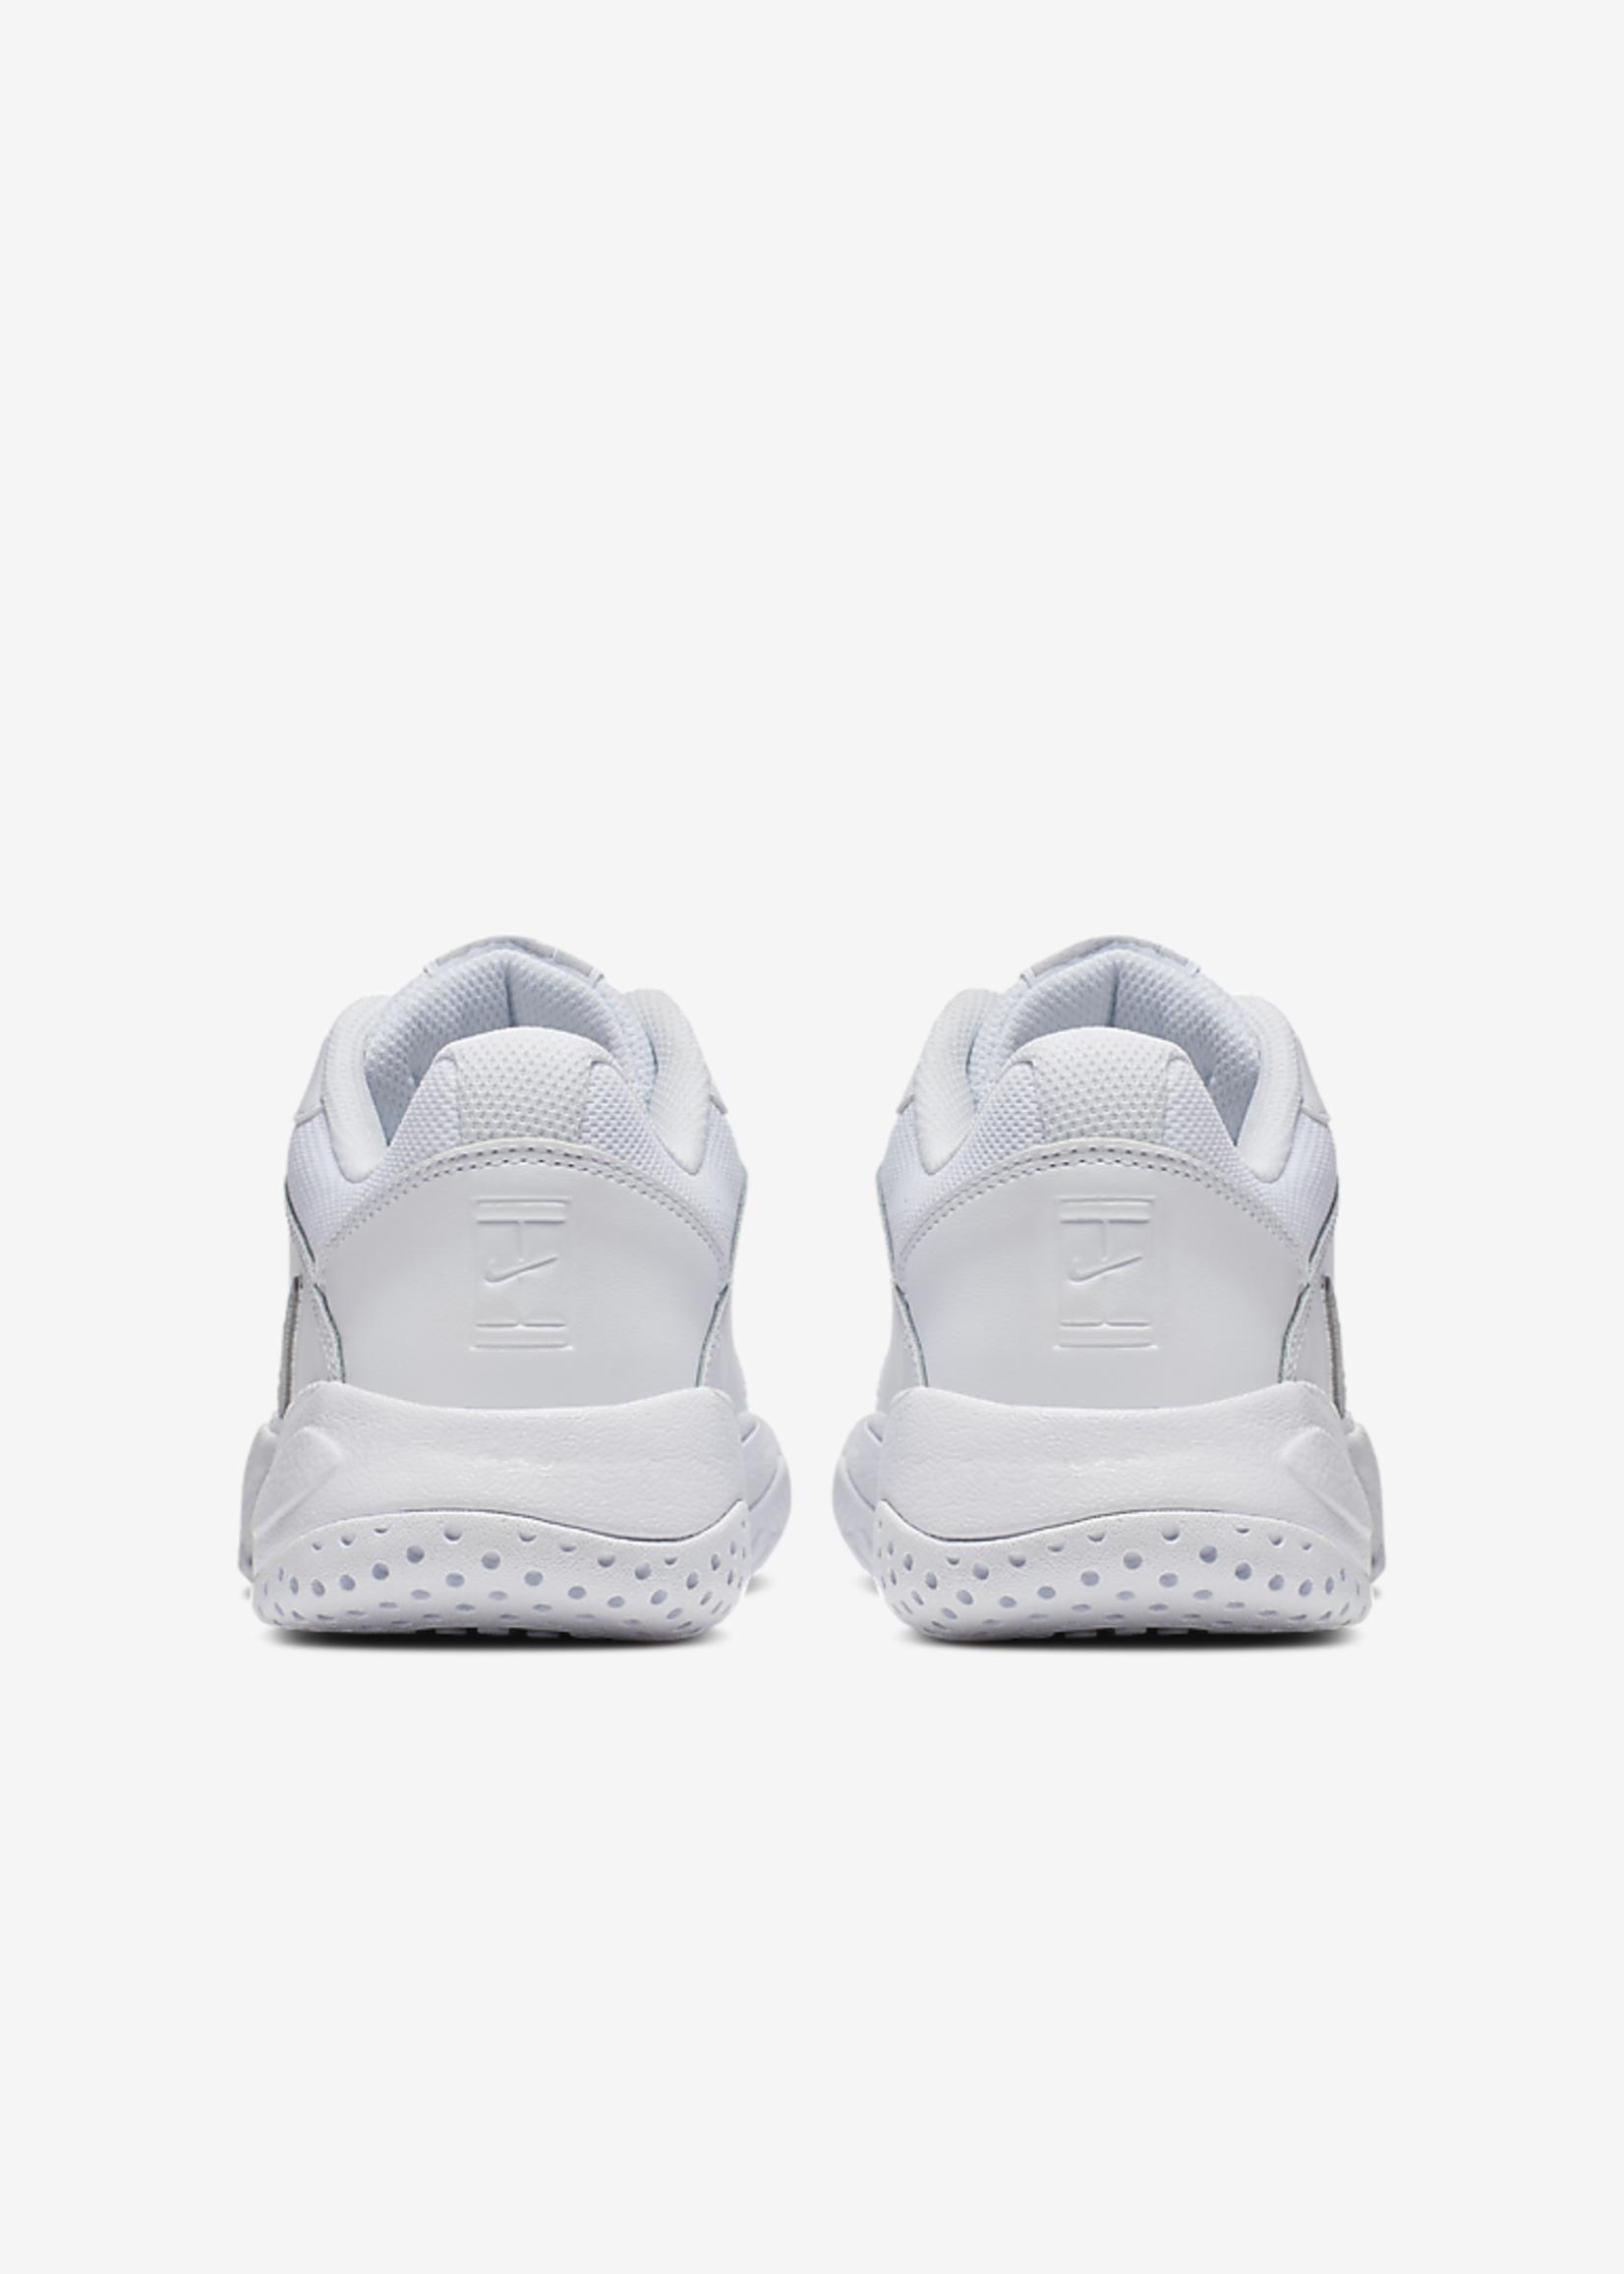 Nike WOMEN'S NIKECOURT LITE 2 AR8838